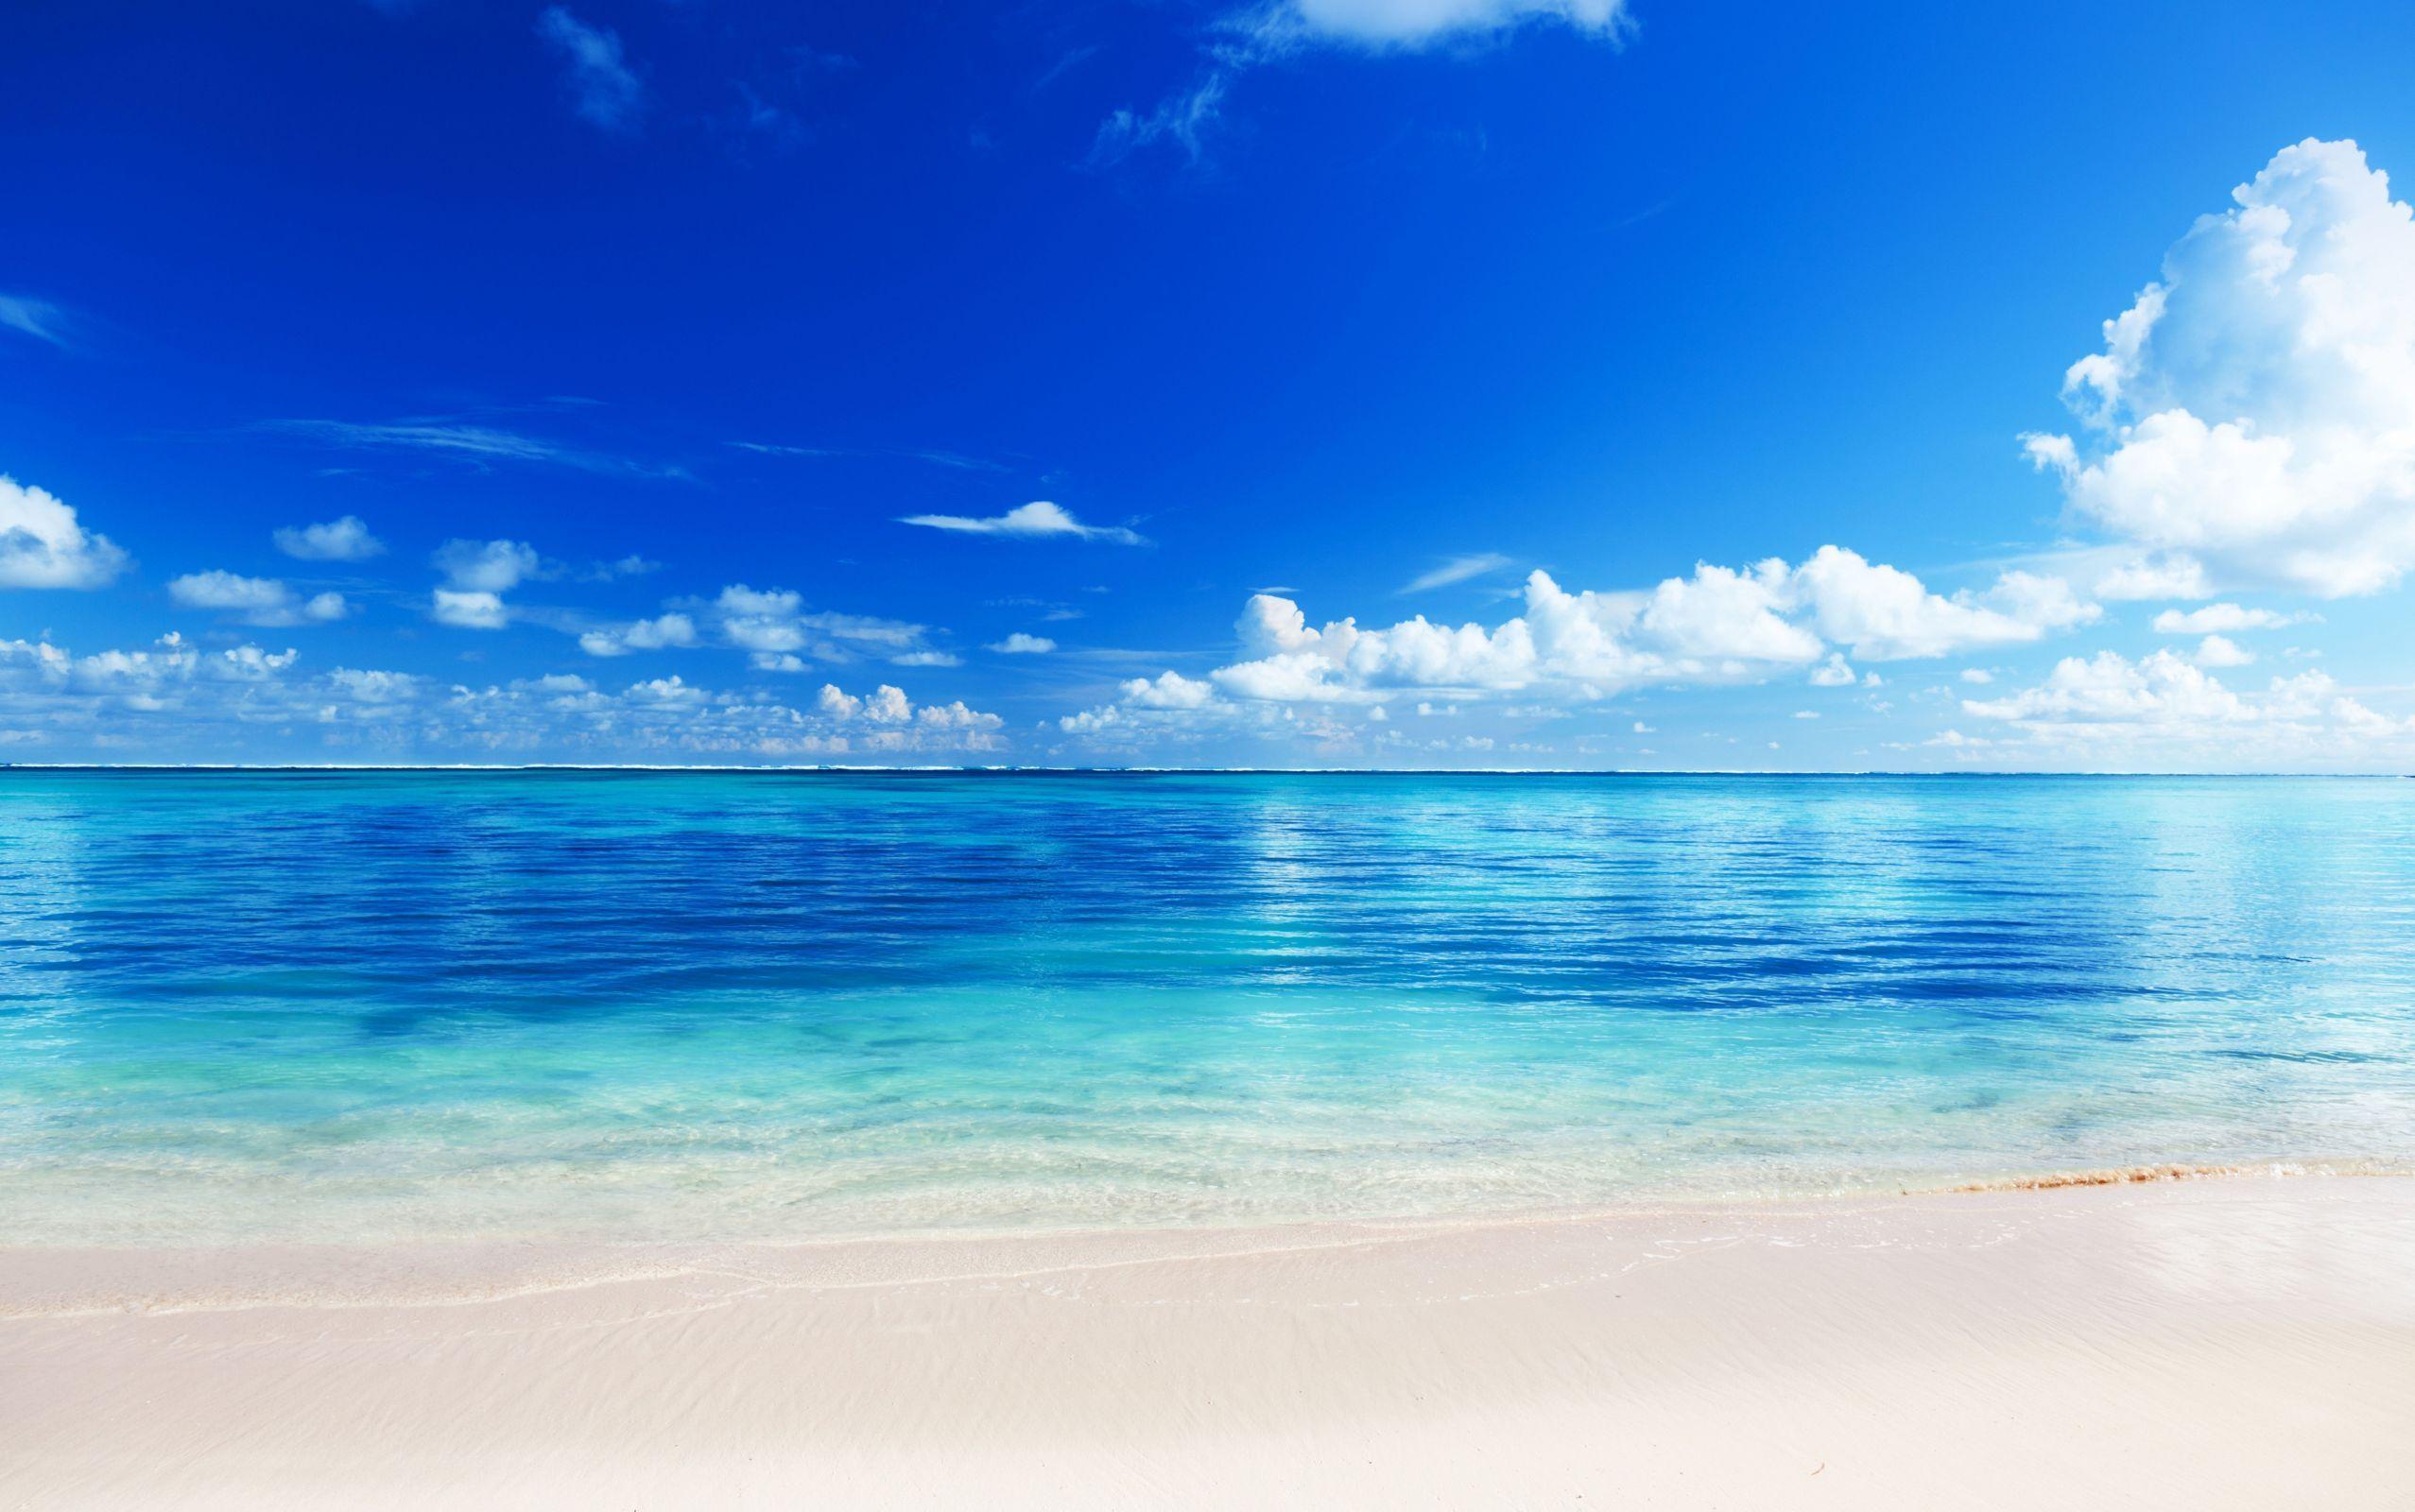 download beach wallpapers Desktop Backgrounds for HD 2555x1600